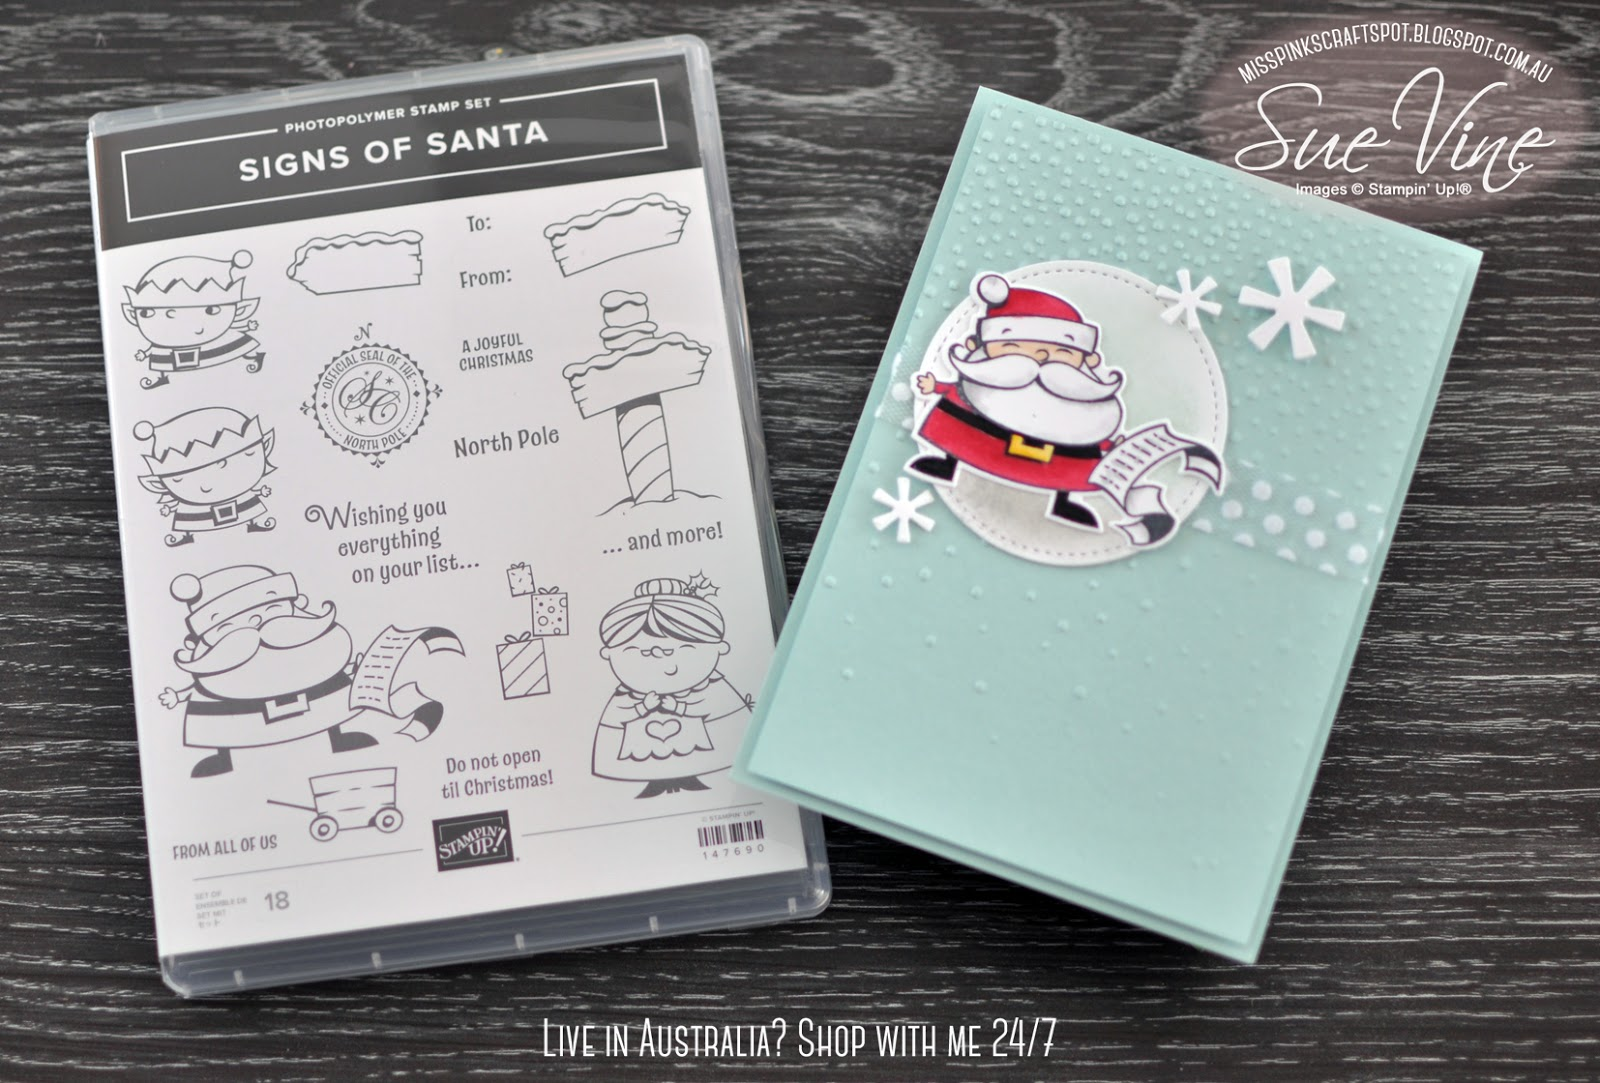 Miss Pinks Craft Spot: Signs of Santa Sneak Peek